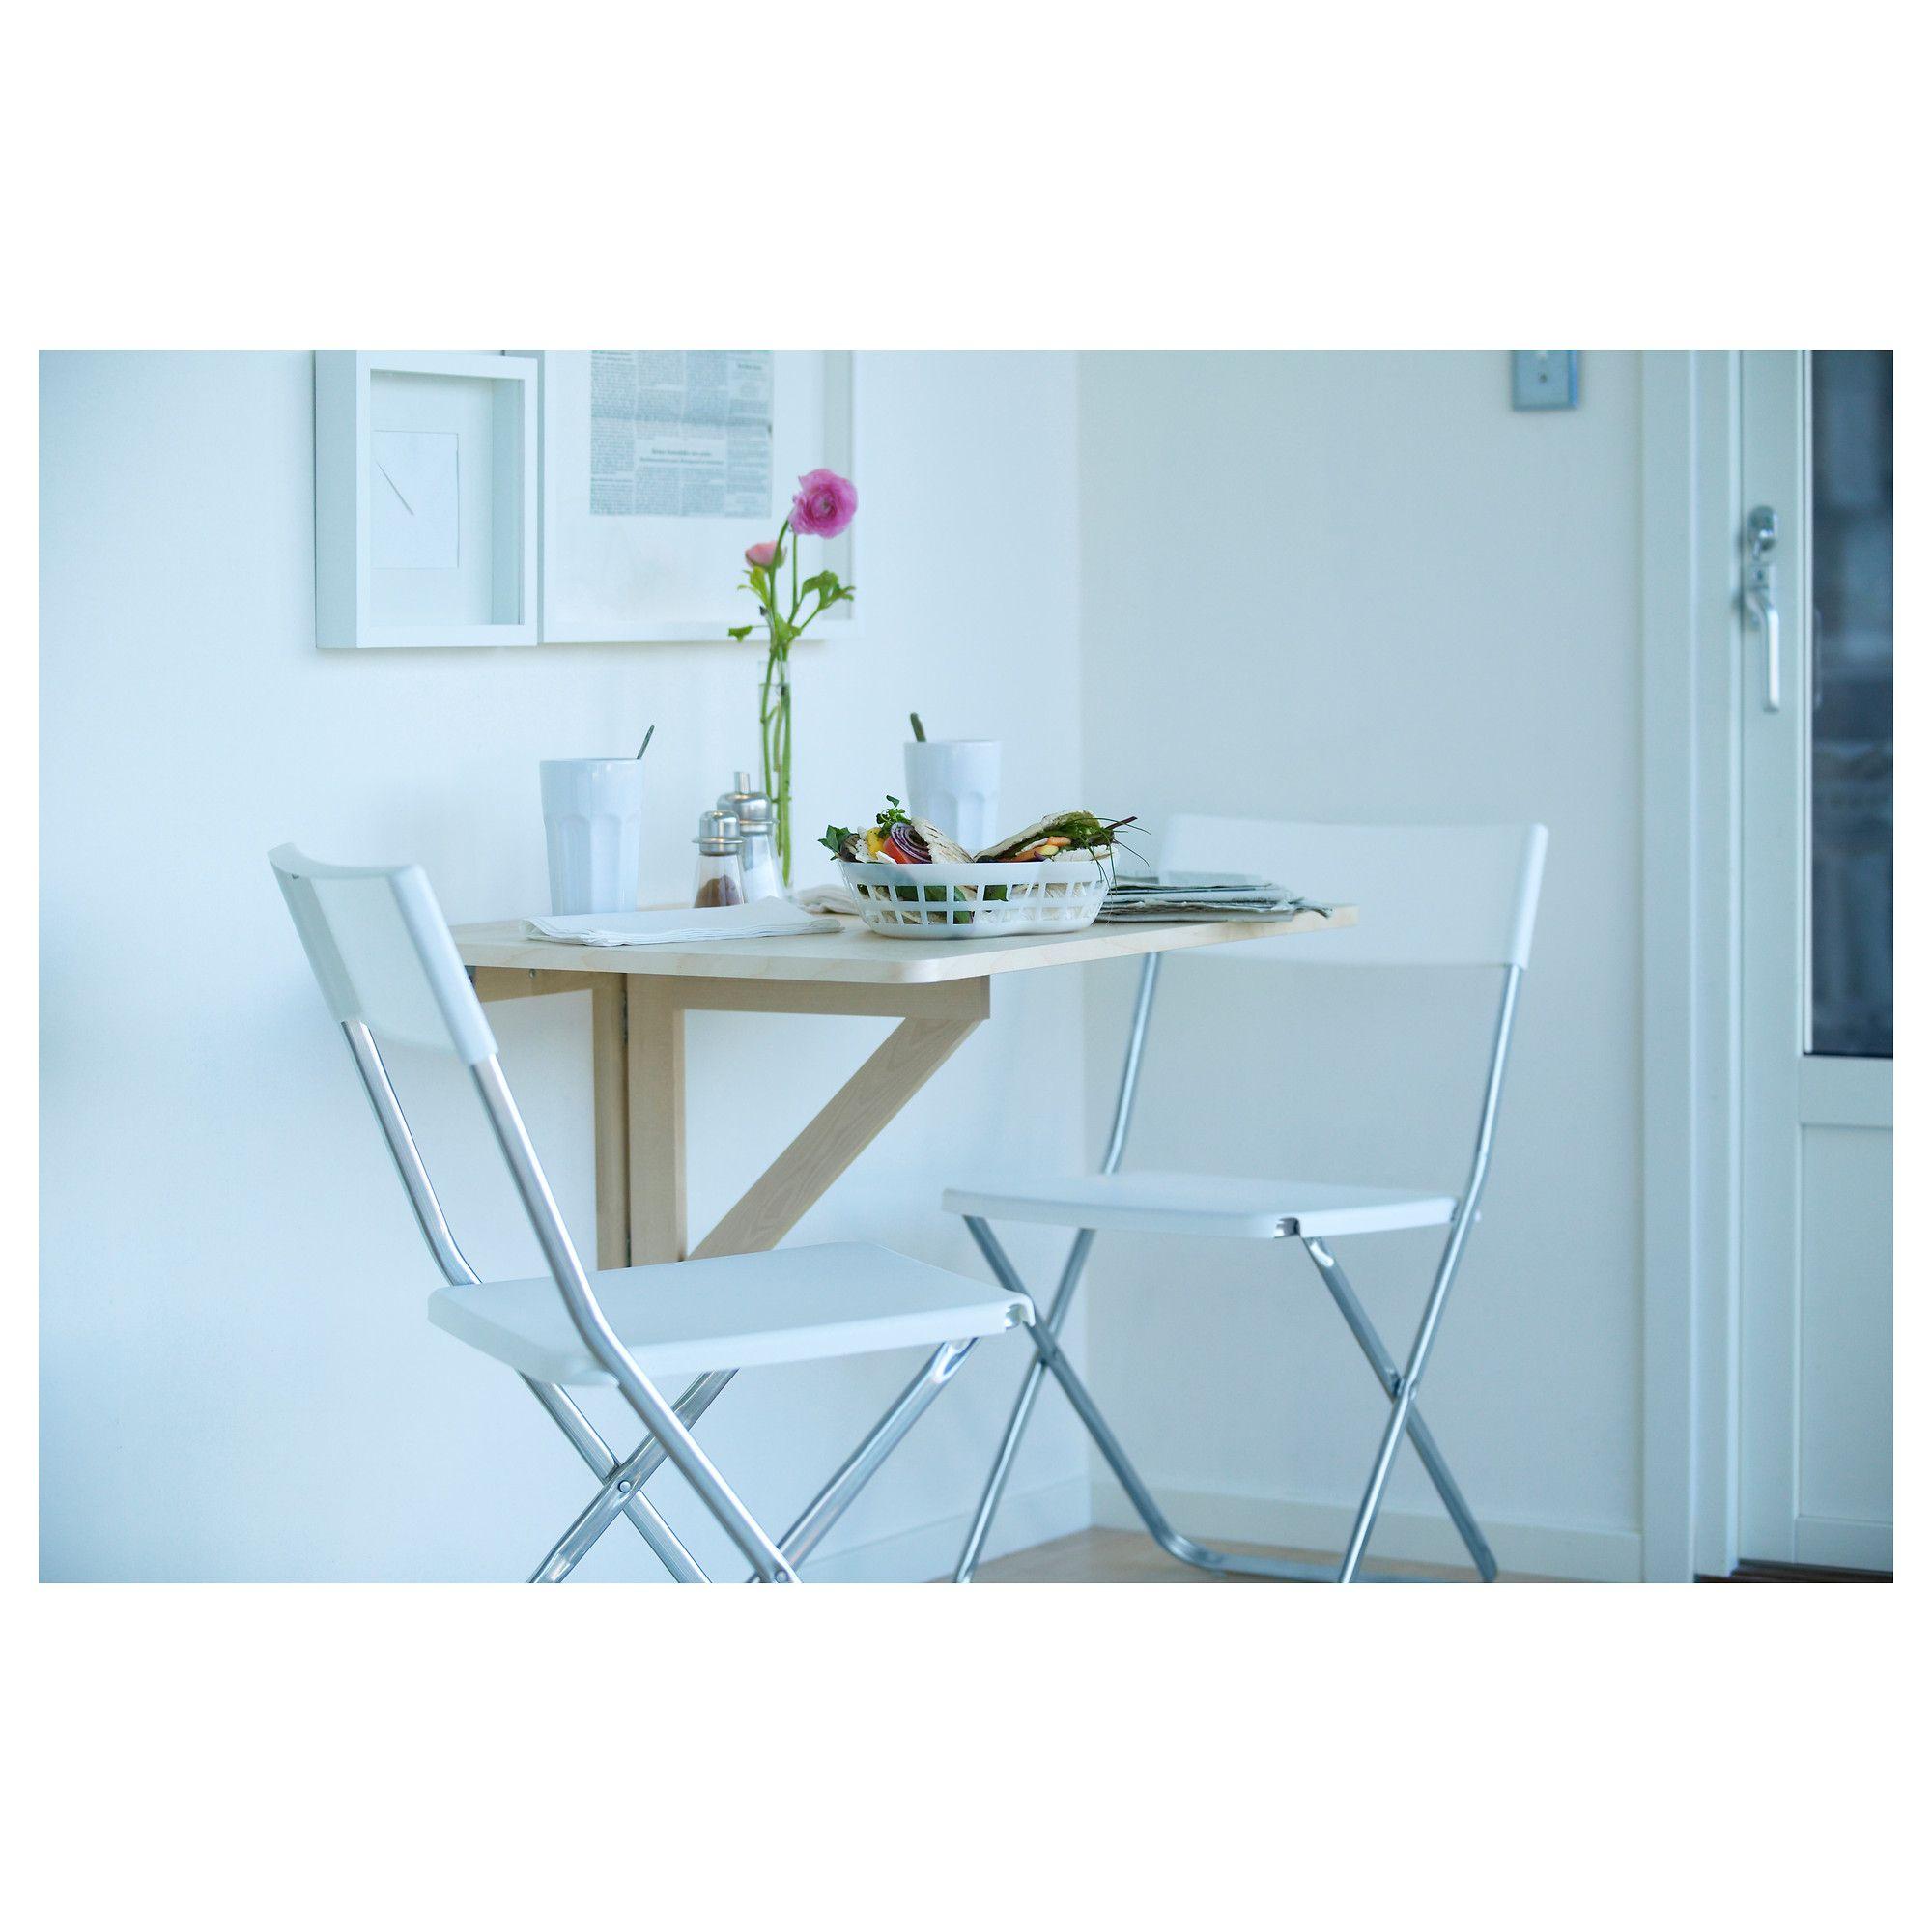 NORBO επιτοίχιο πτυσσόμενο τραπέζι - IKEA | industrial interior ...